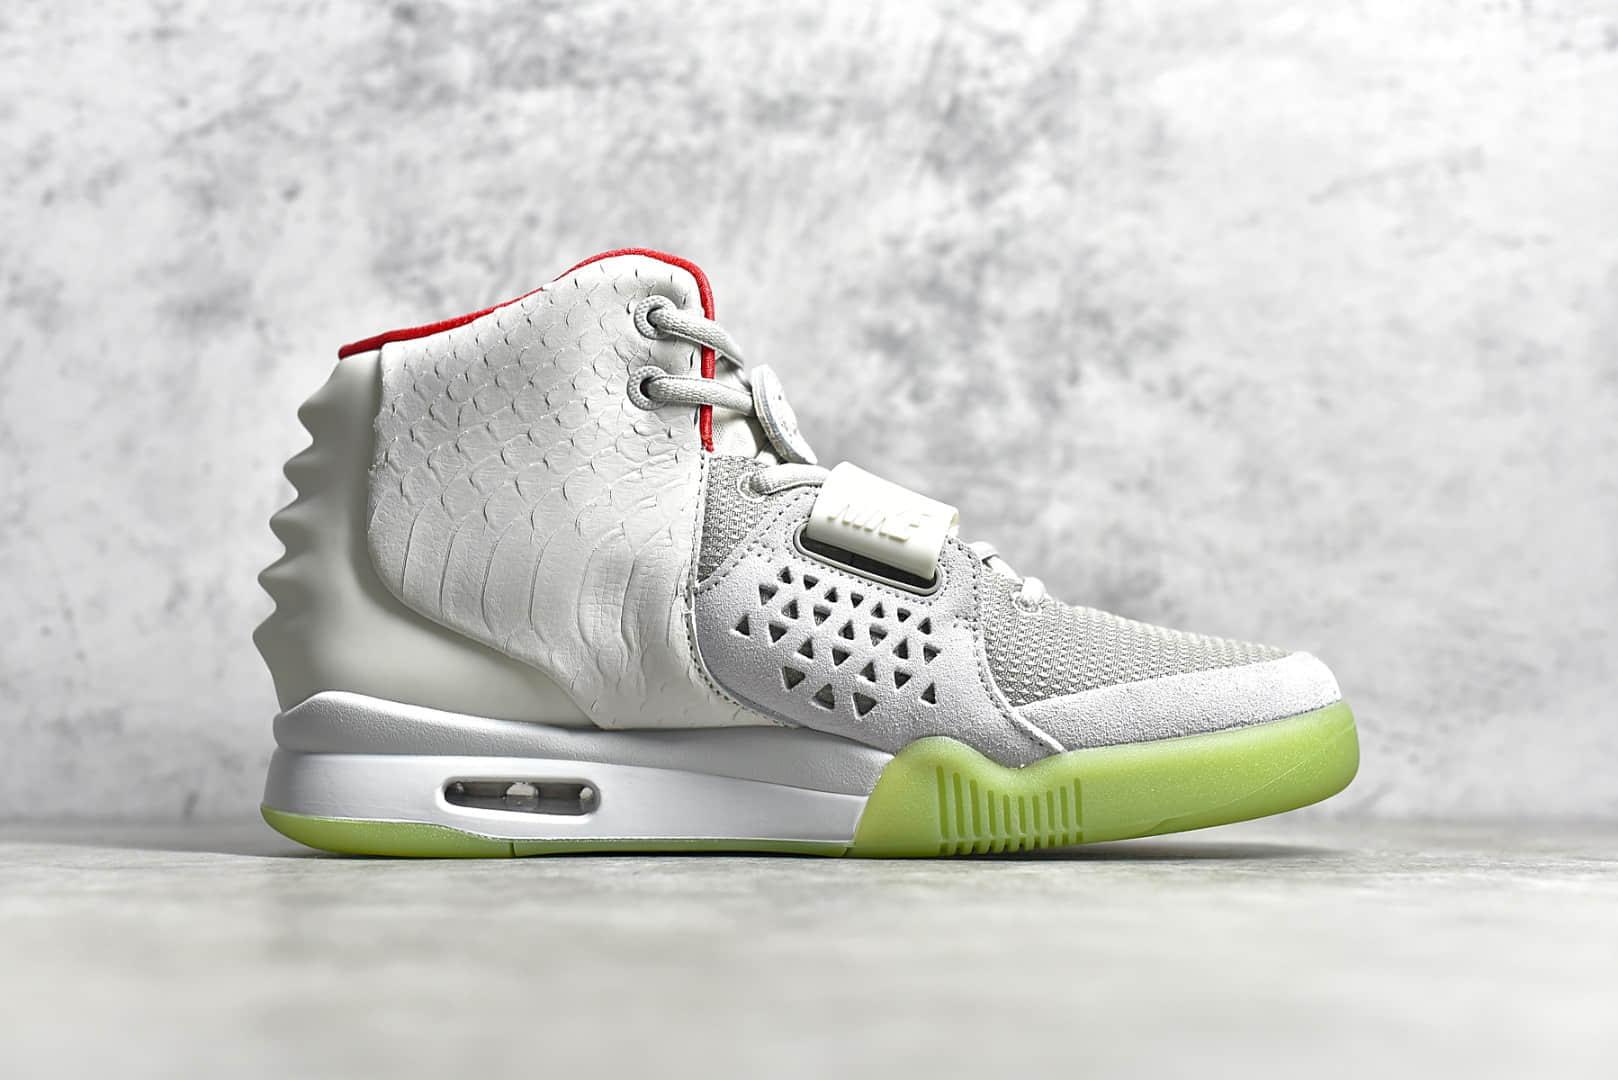 耐克椰子灰白色椰子球鞋 NIKE AIR YEEZY 2 NRG KANYE WEST 灰白 耐克椰子莆田纯原复刻Nike Air Yeezy 2 货号:508214-010-潮流者之家